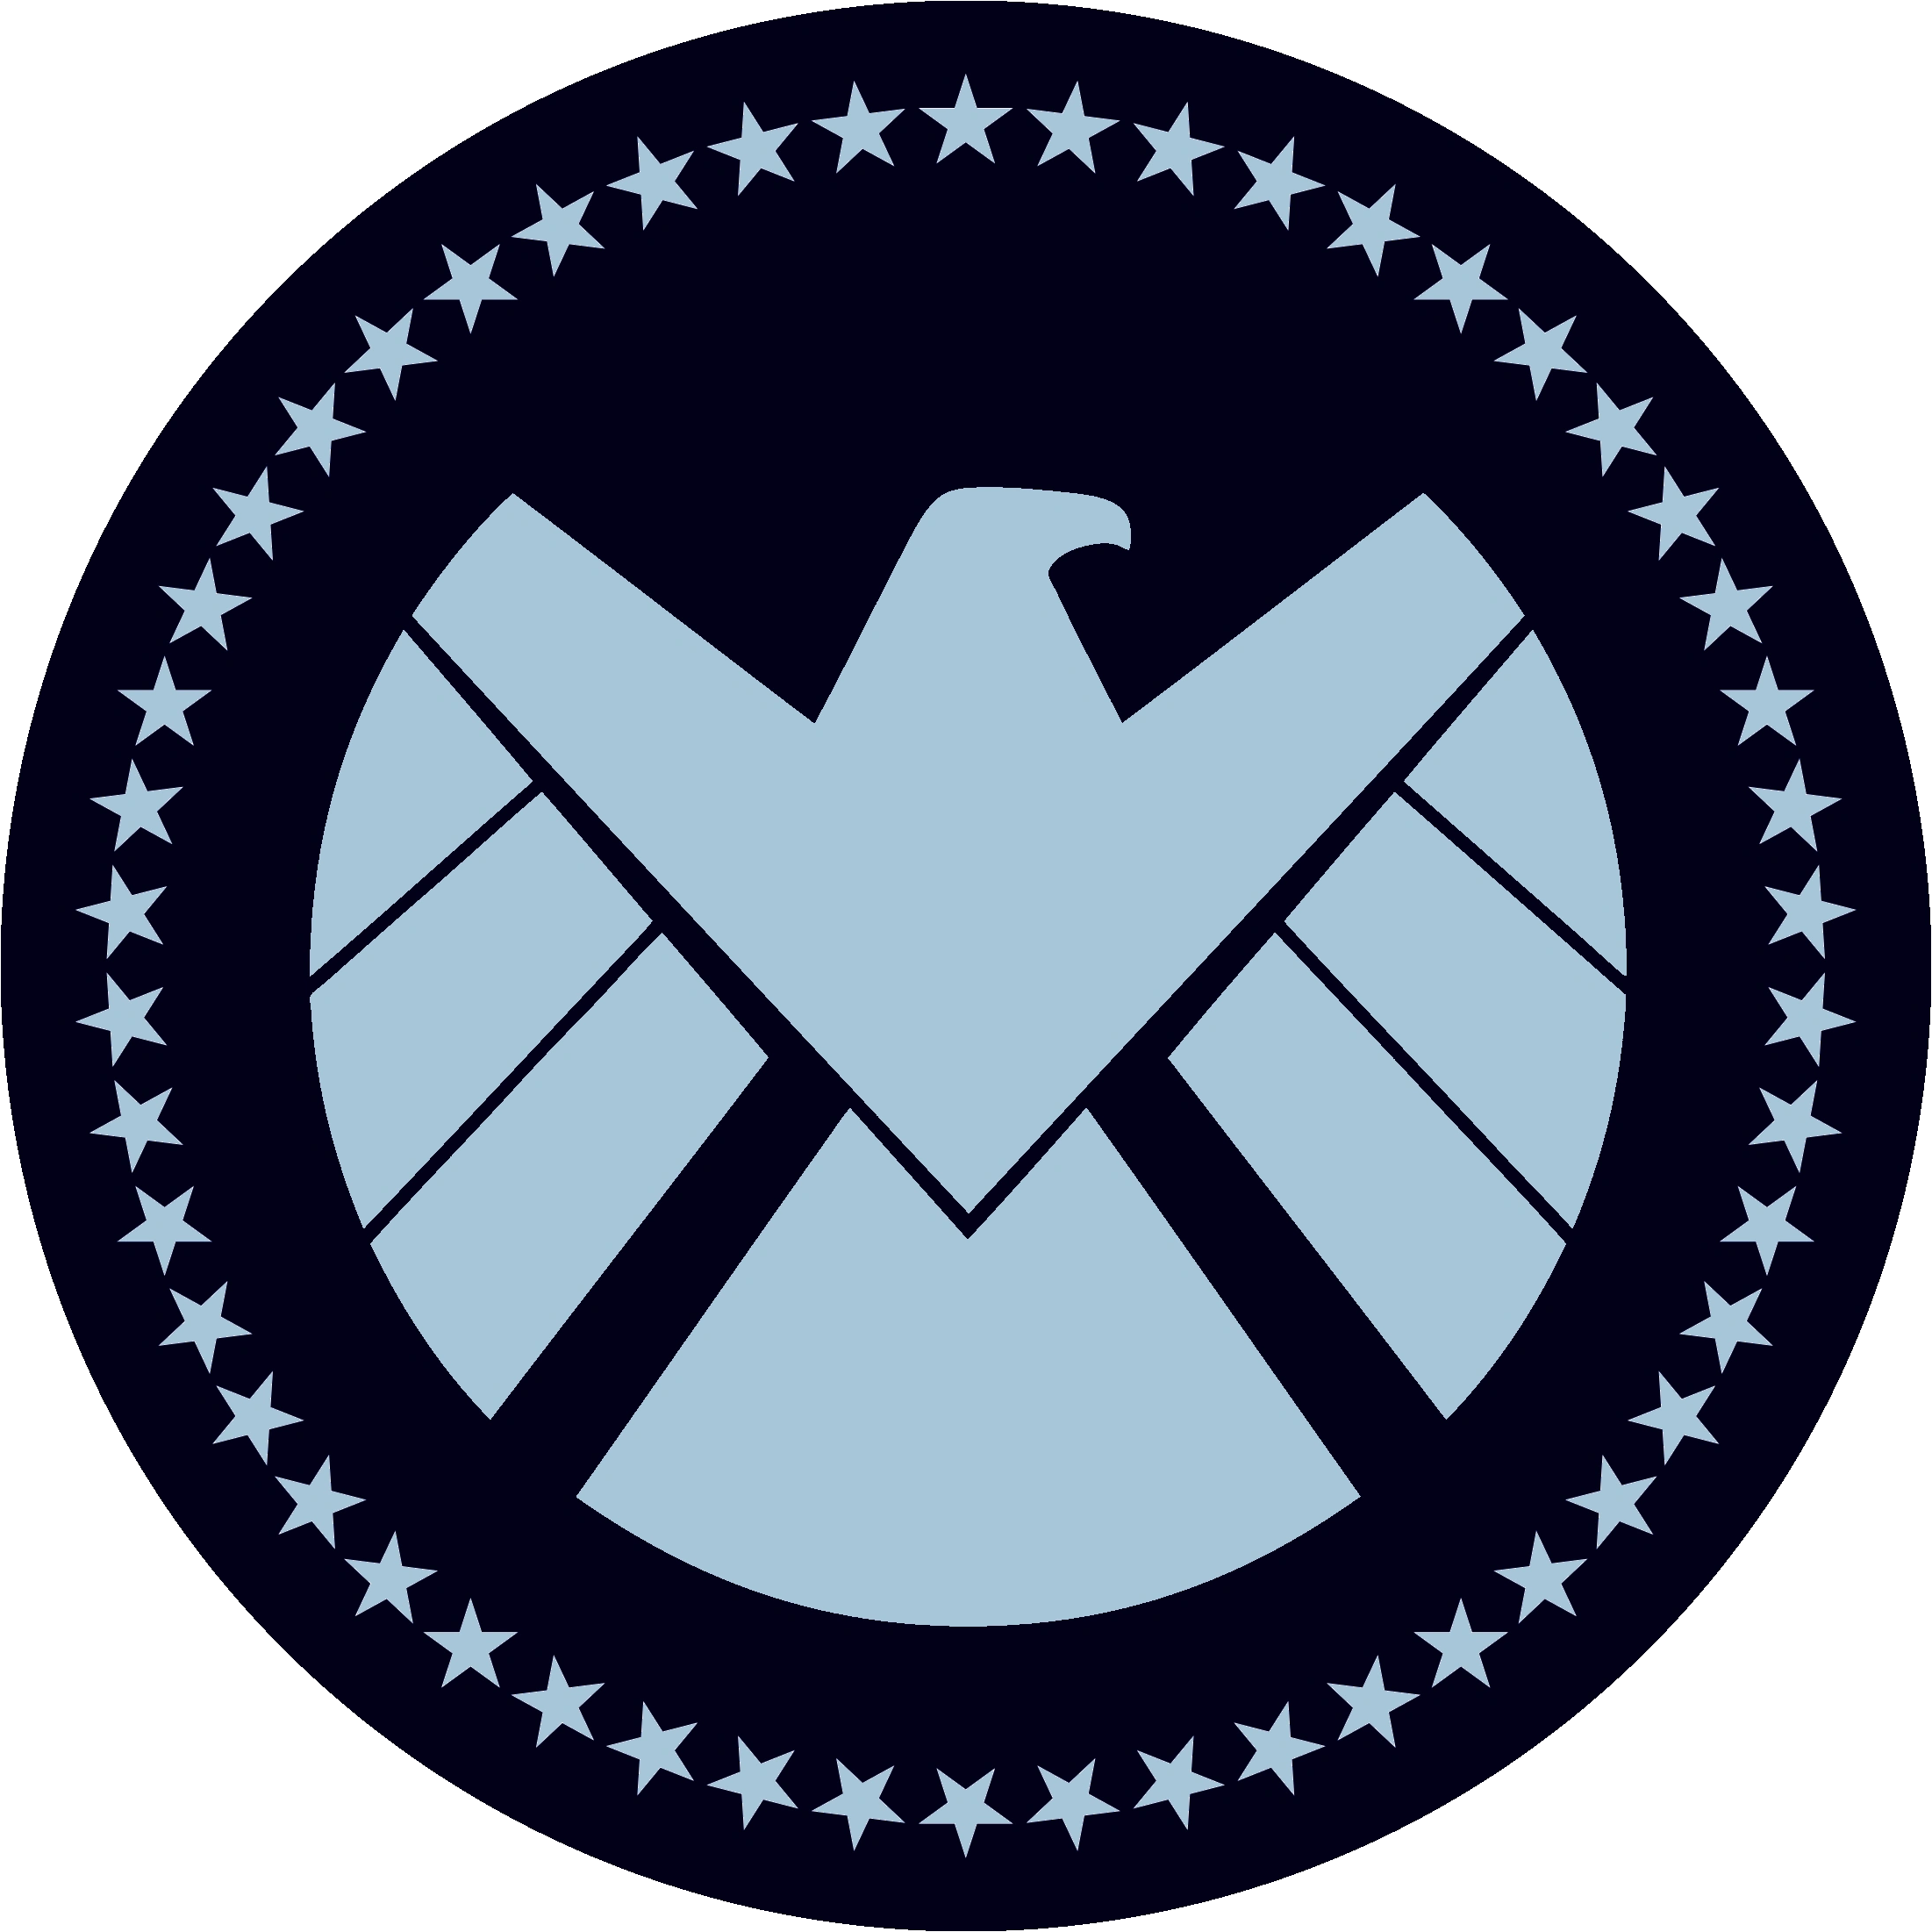 S.H.I.E.L.D. | Marvel Cinematic Universe Wiki | Fandom